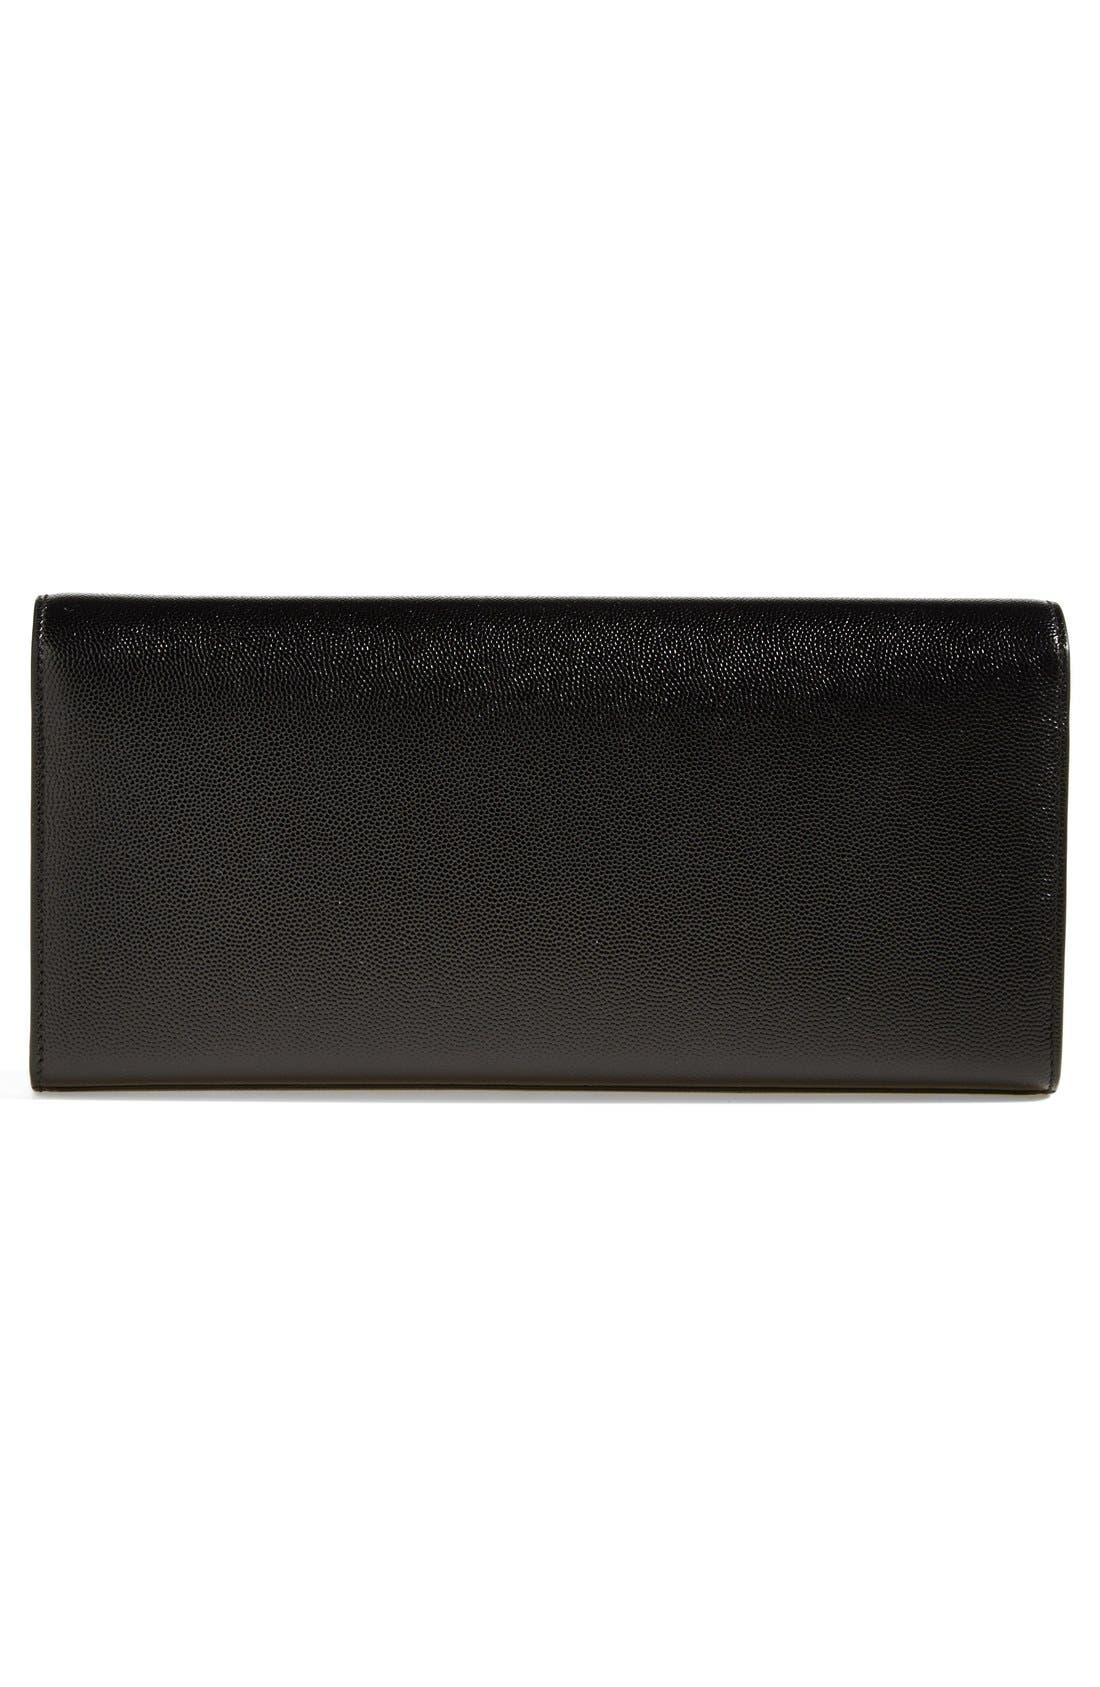 Alternate Image 3  - Saint Laurent 'Monogram' Leather Clutch